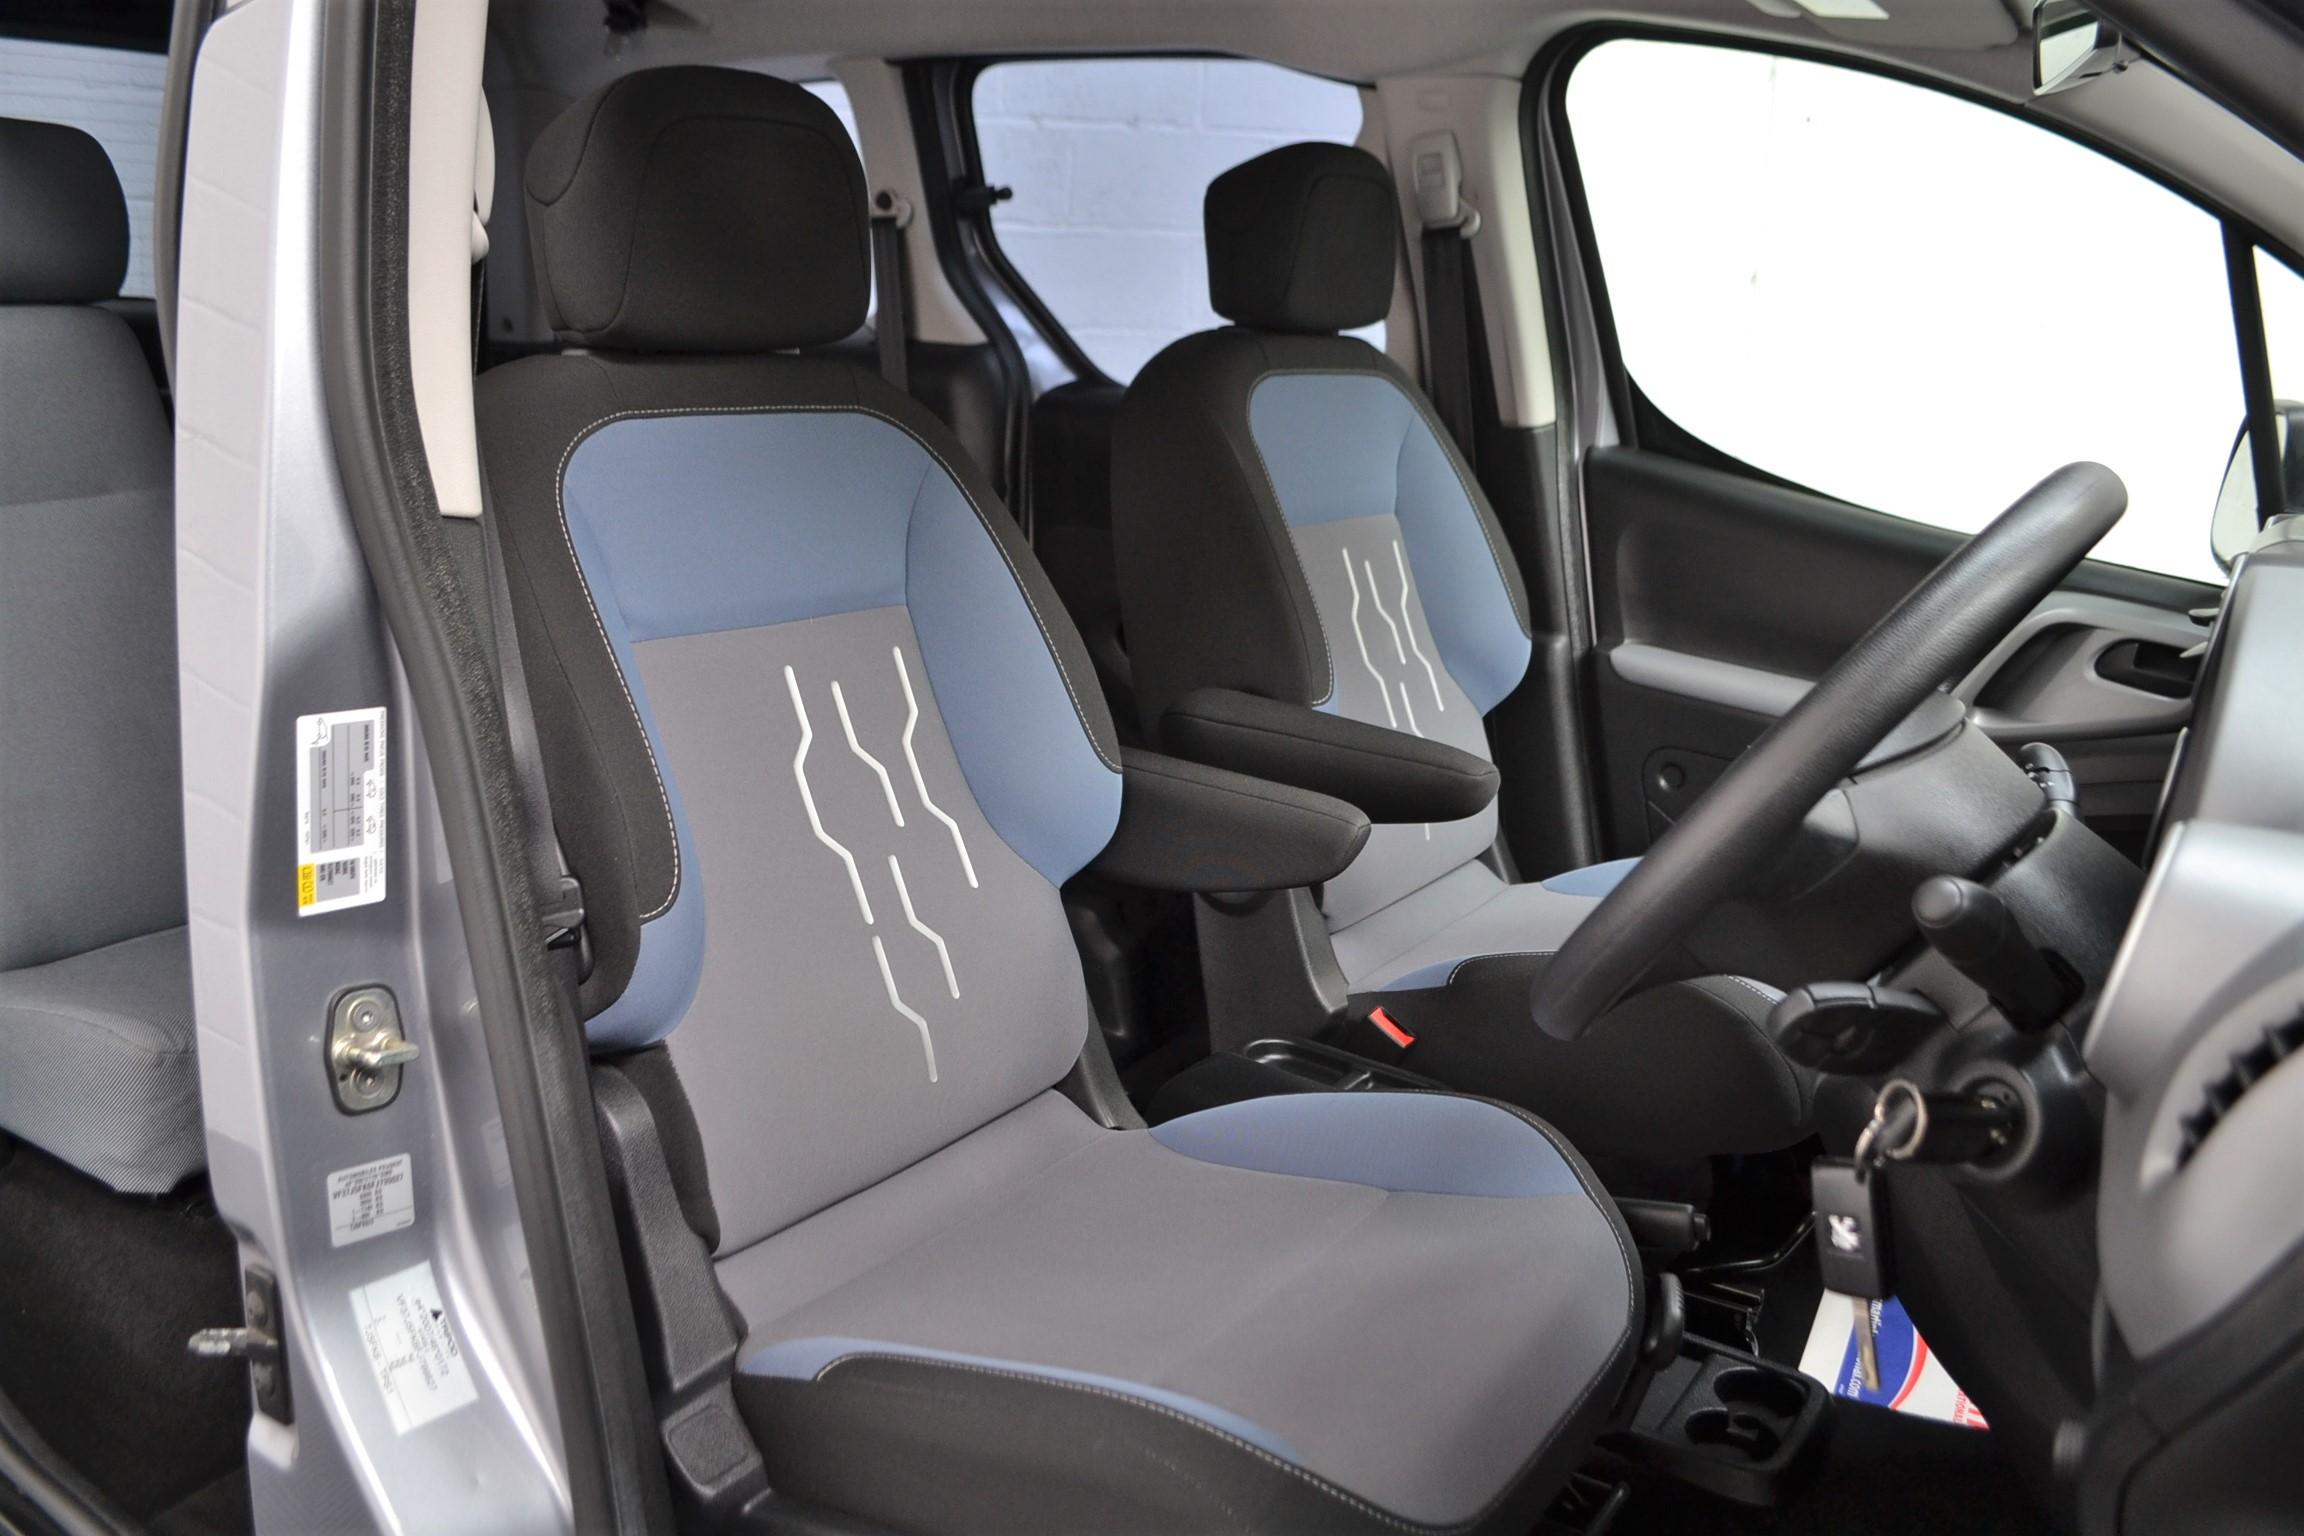 Used Wav Cars for Sale UK Citroen Berlingo WAV Car Peugeot Partner Petrol Wheelchair Accessible Vehicles Buy Sell Bristol Somerset Devon Dorset 2